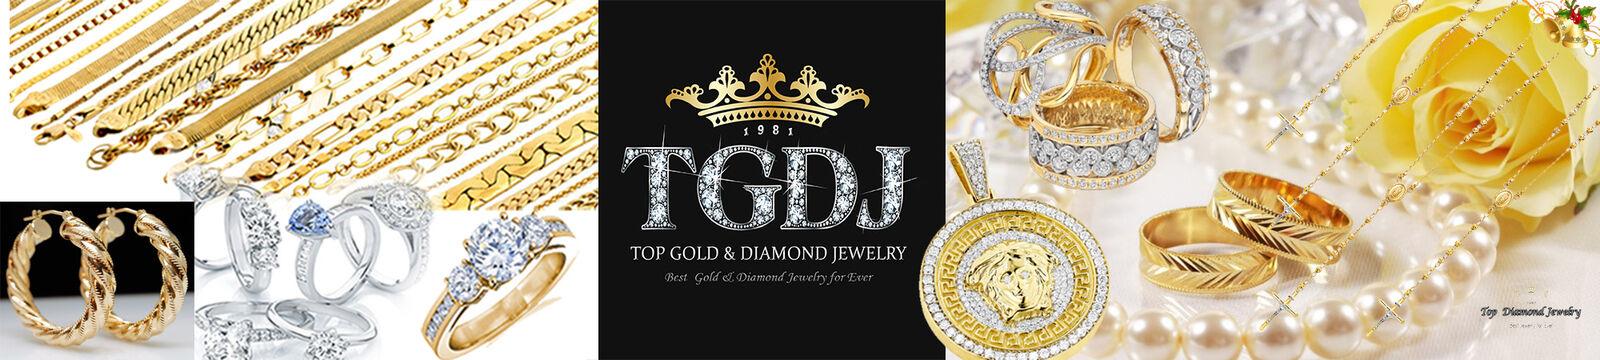 Top Gold & Diamond Jewelry